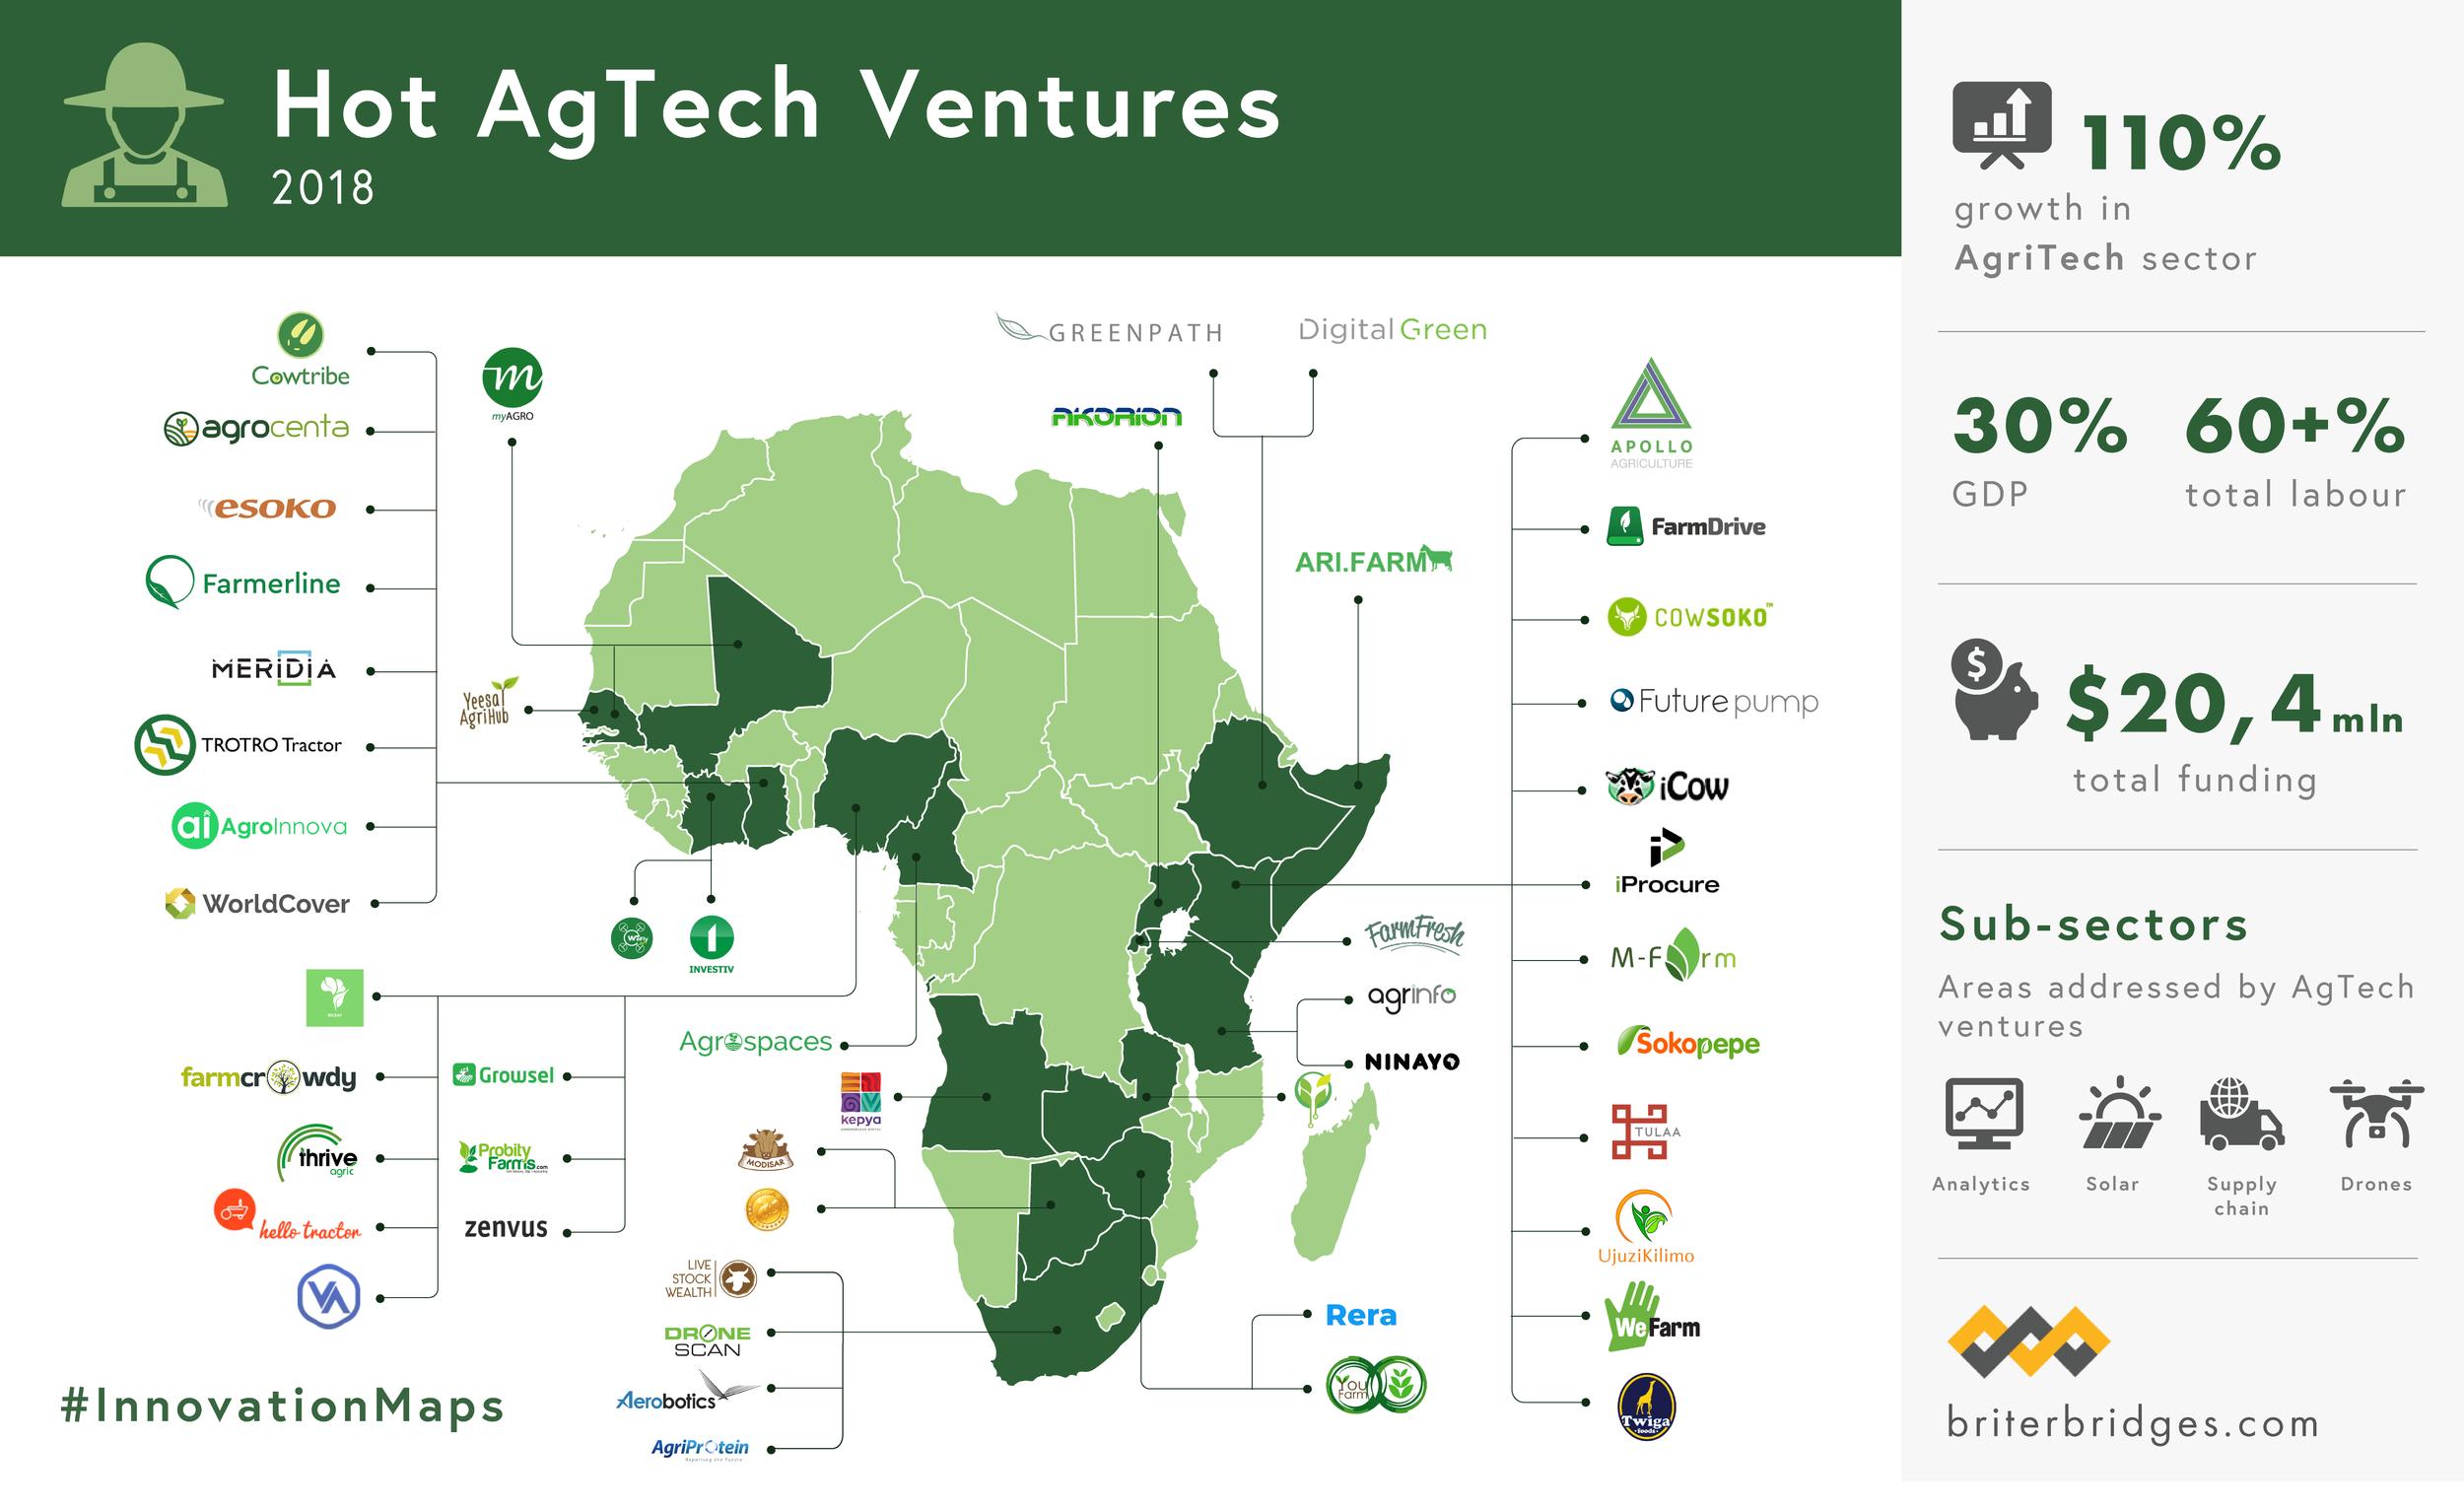 Hot AgTech Ventures in Africa